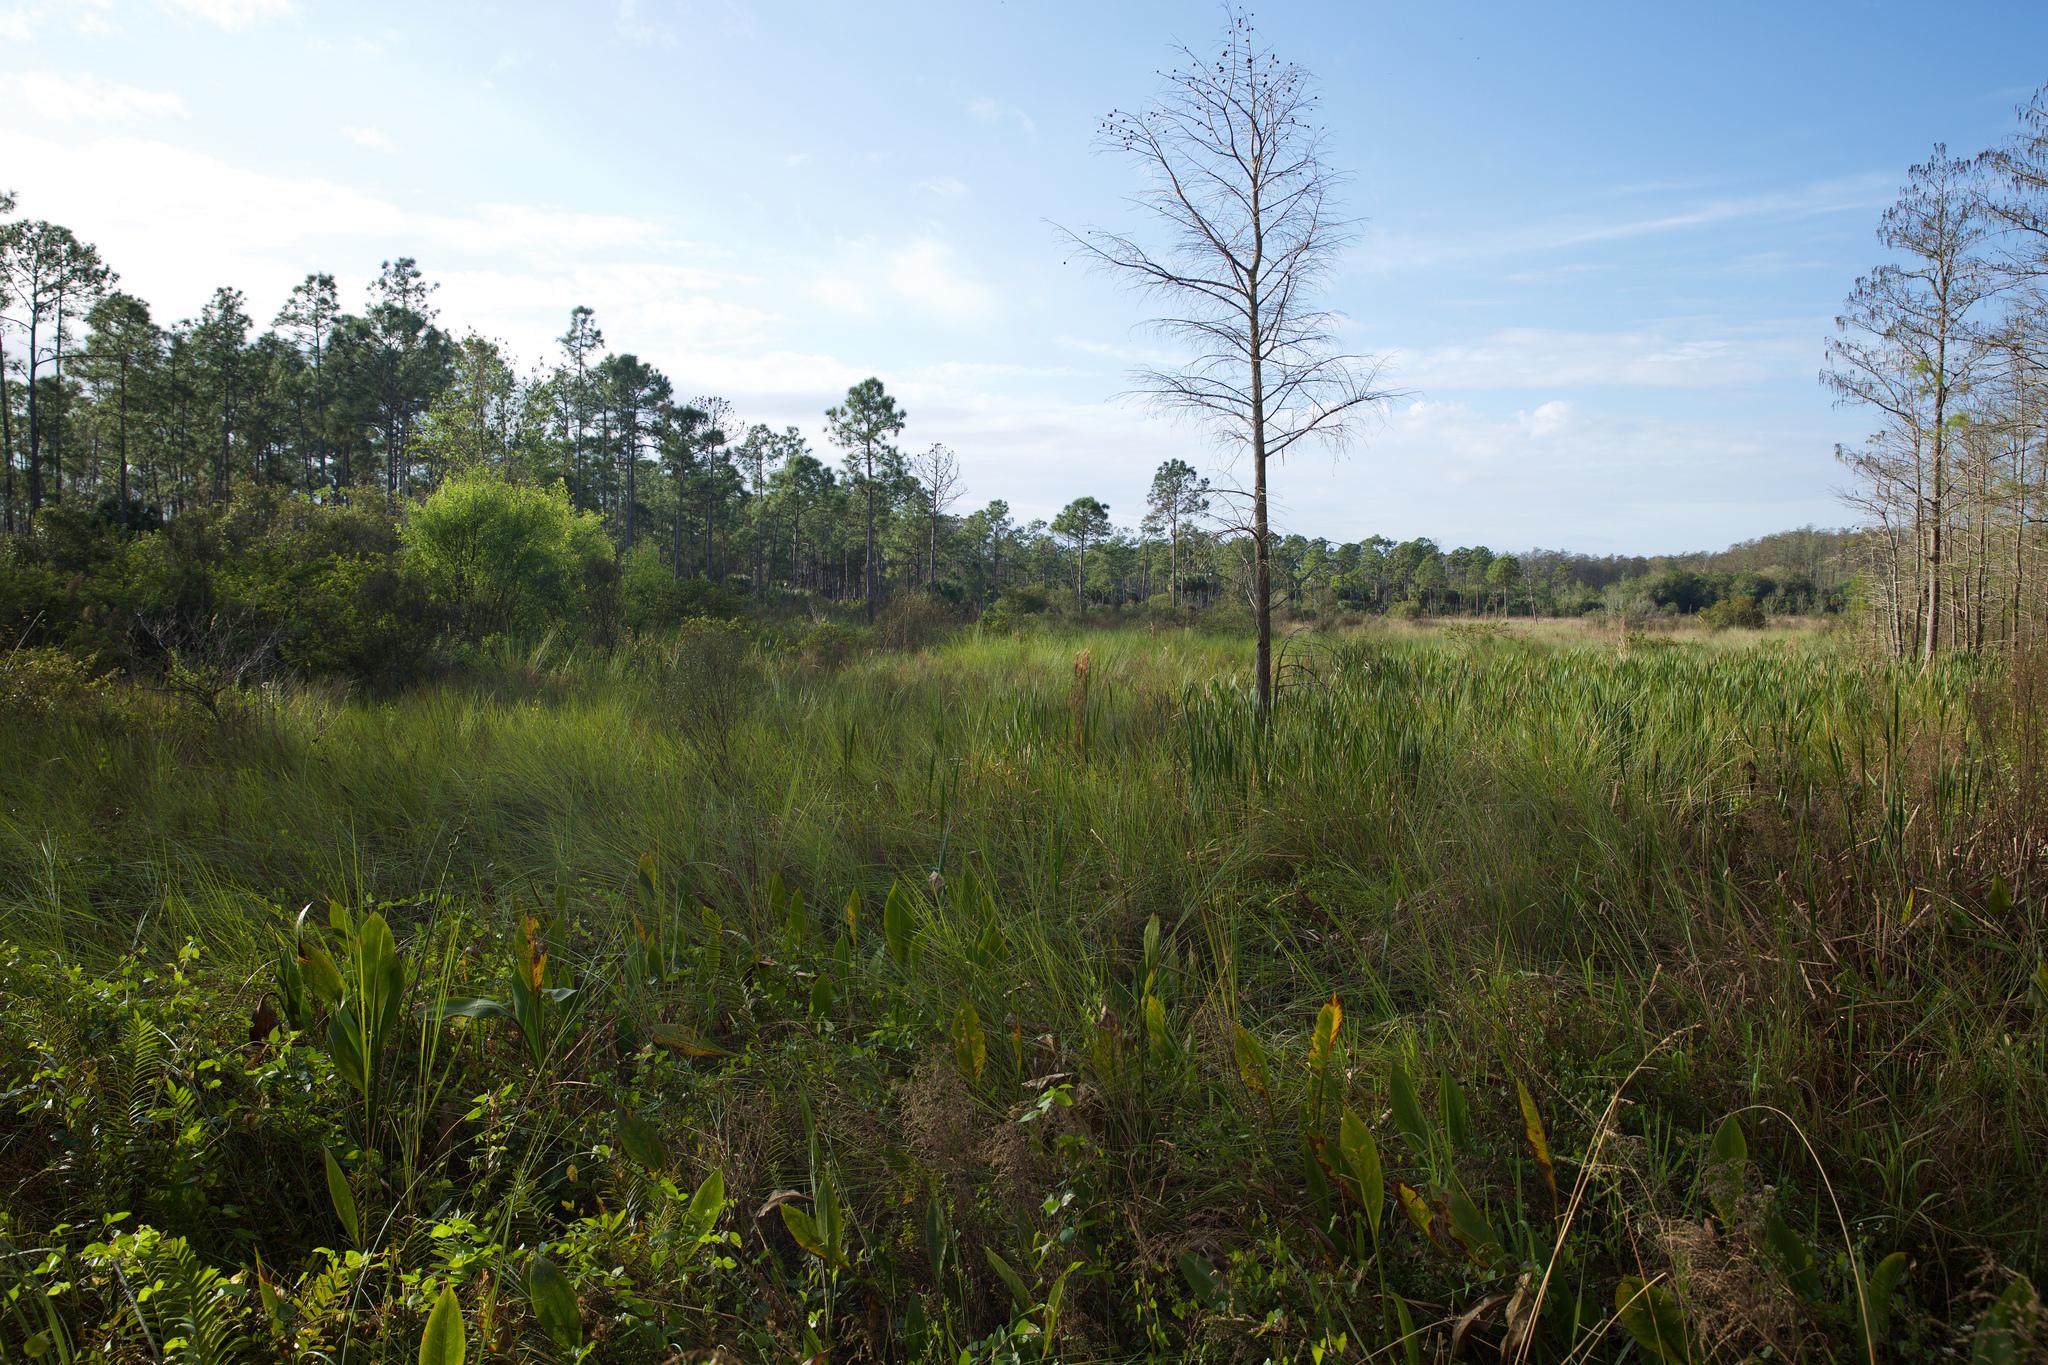 Corkscrew Swamp Habitat